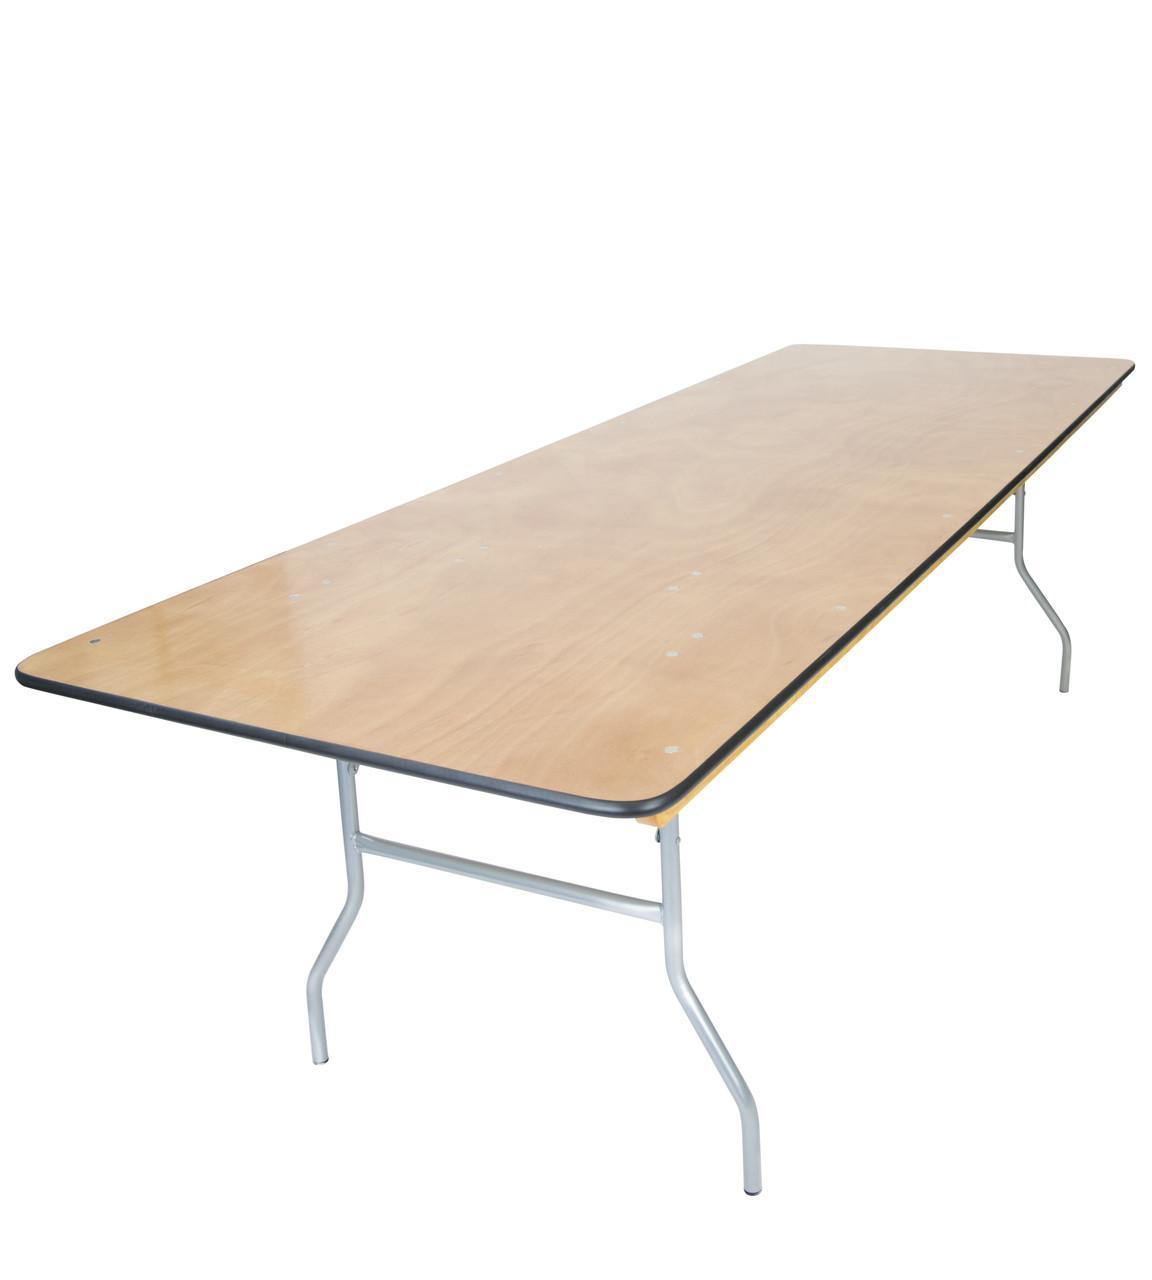 Luan 40 X72 6ft Rectangle Wood Folding Table Vinyl Edging Bolt Thru Top Locking Steel Frame Foldingchairsandtables Com